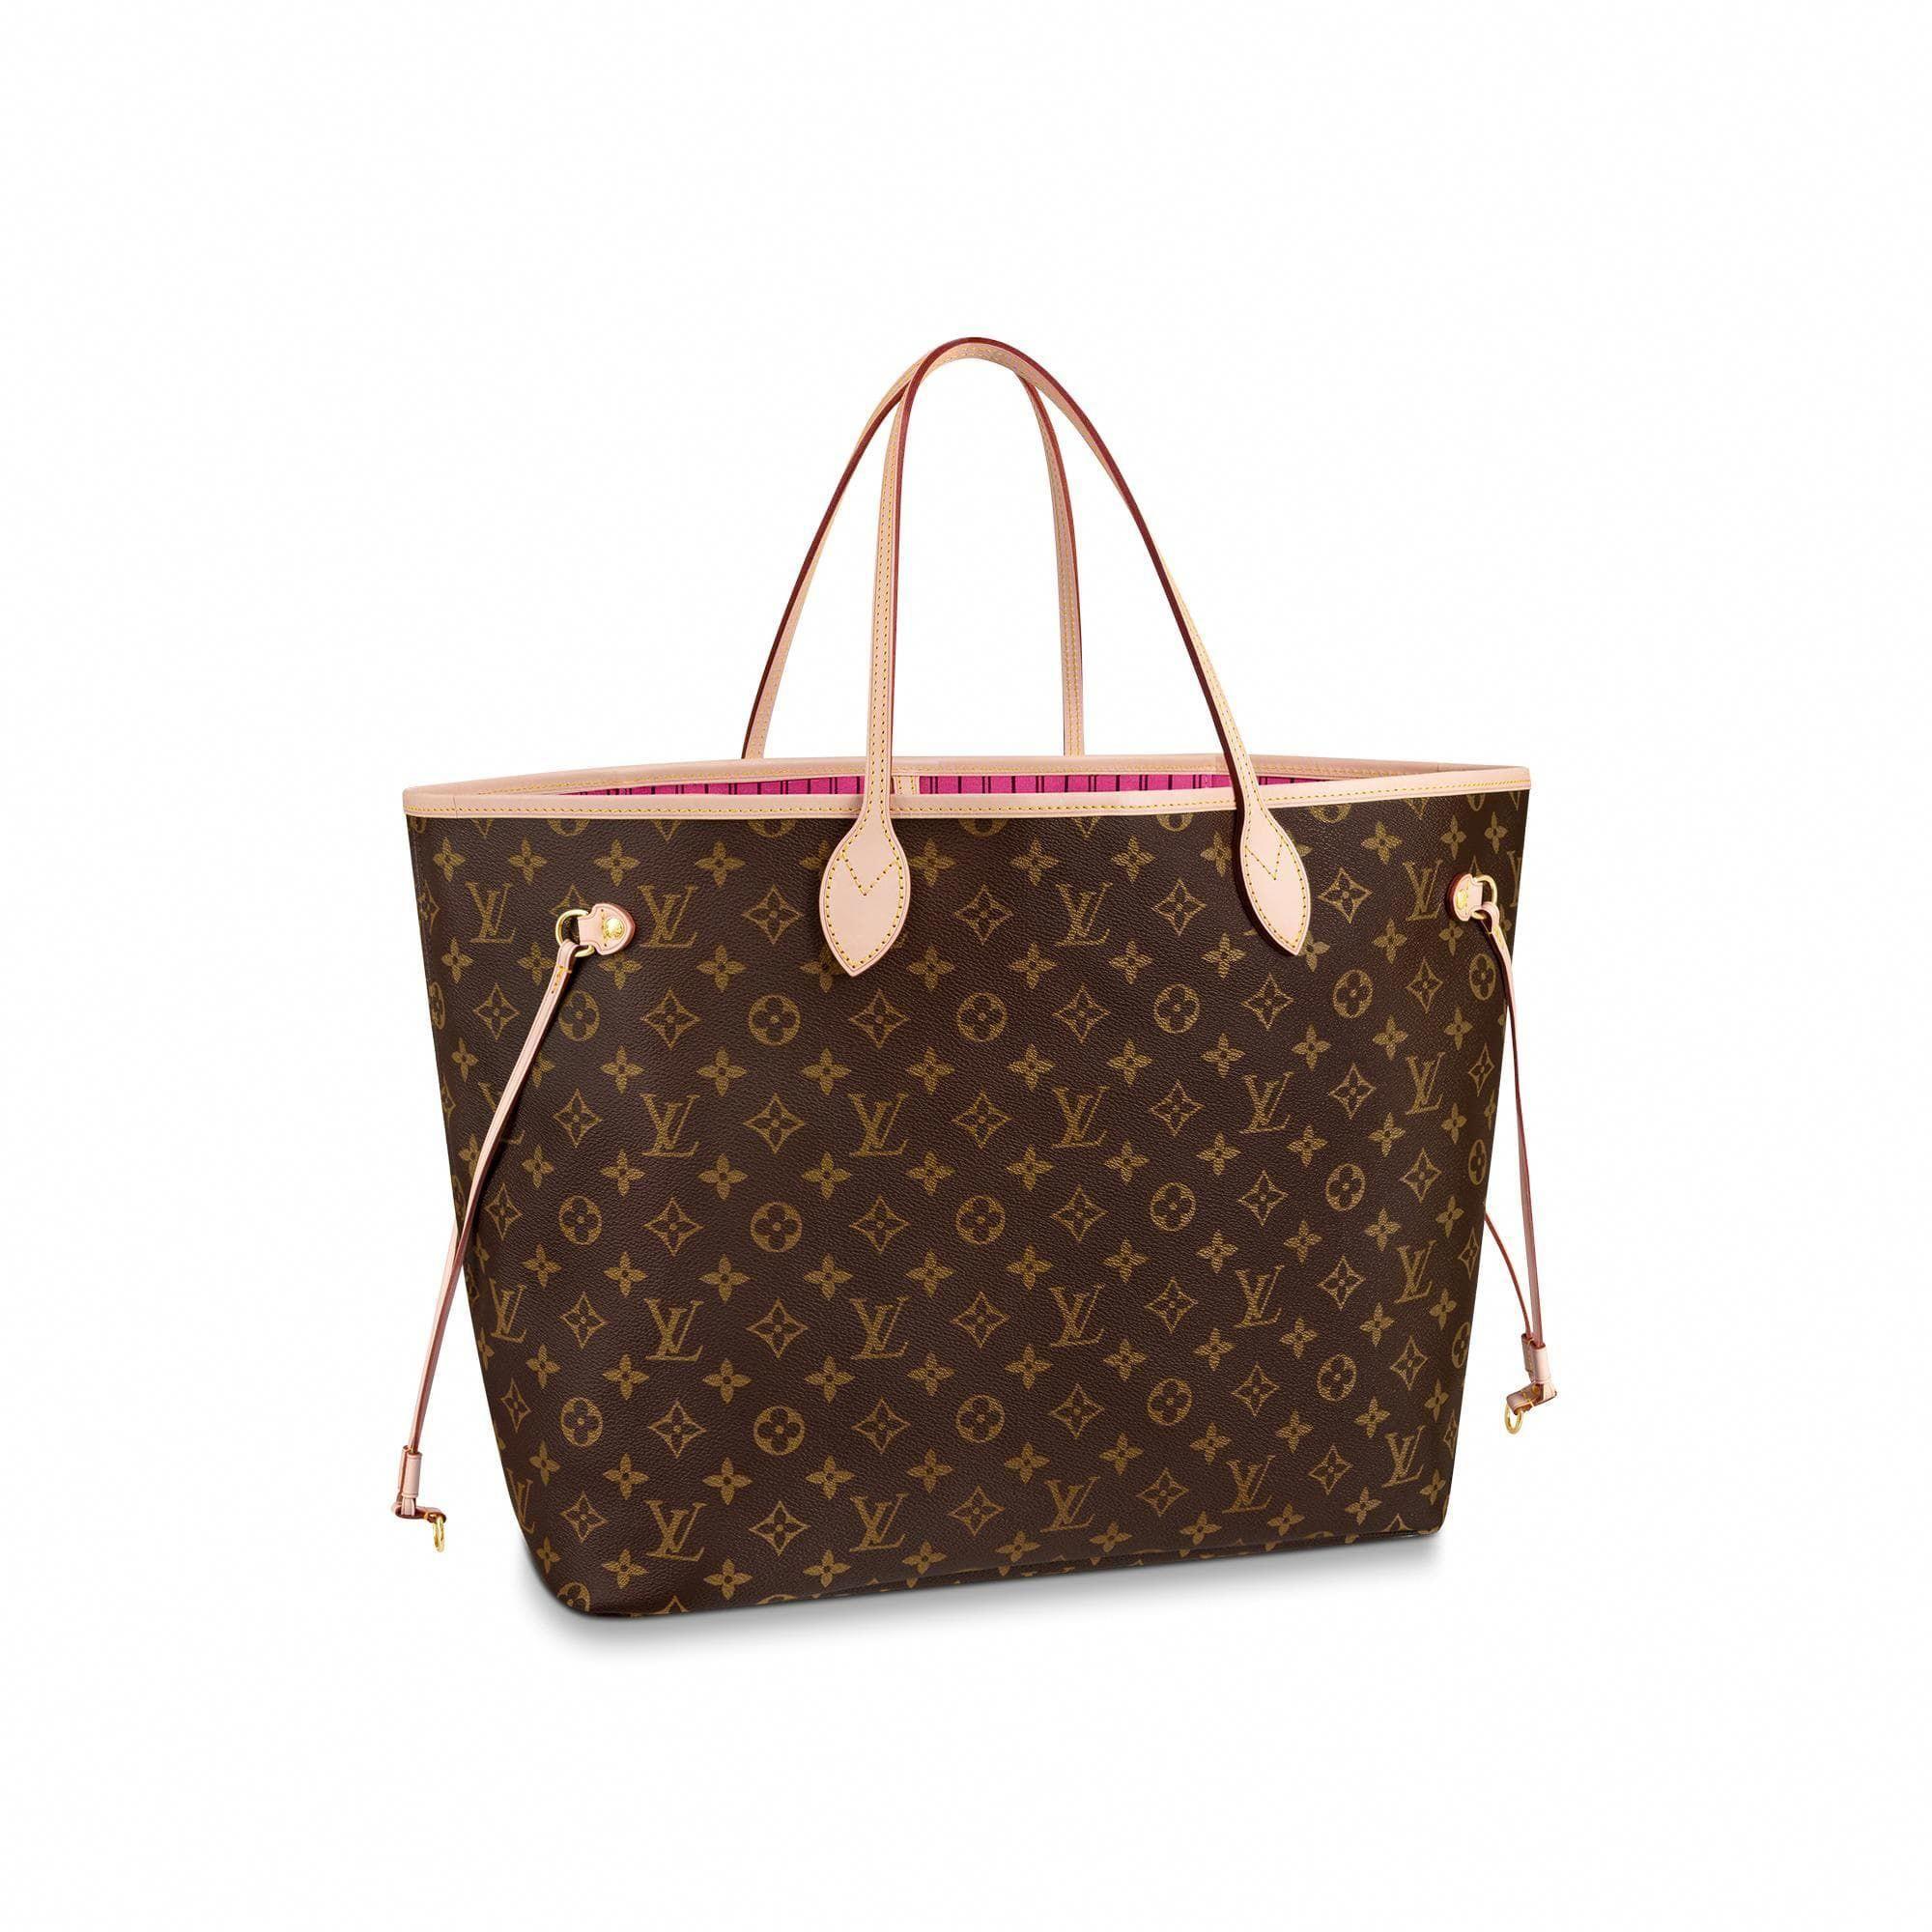 d359ac79ebc6 Neverfull MM - Louis Vuitton Monogram Handbag for Women